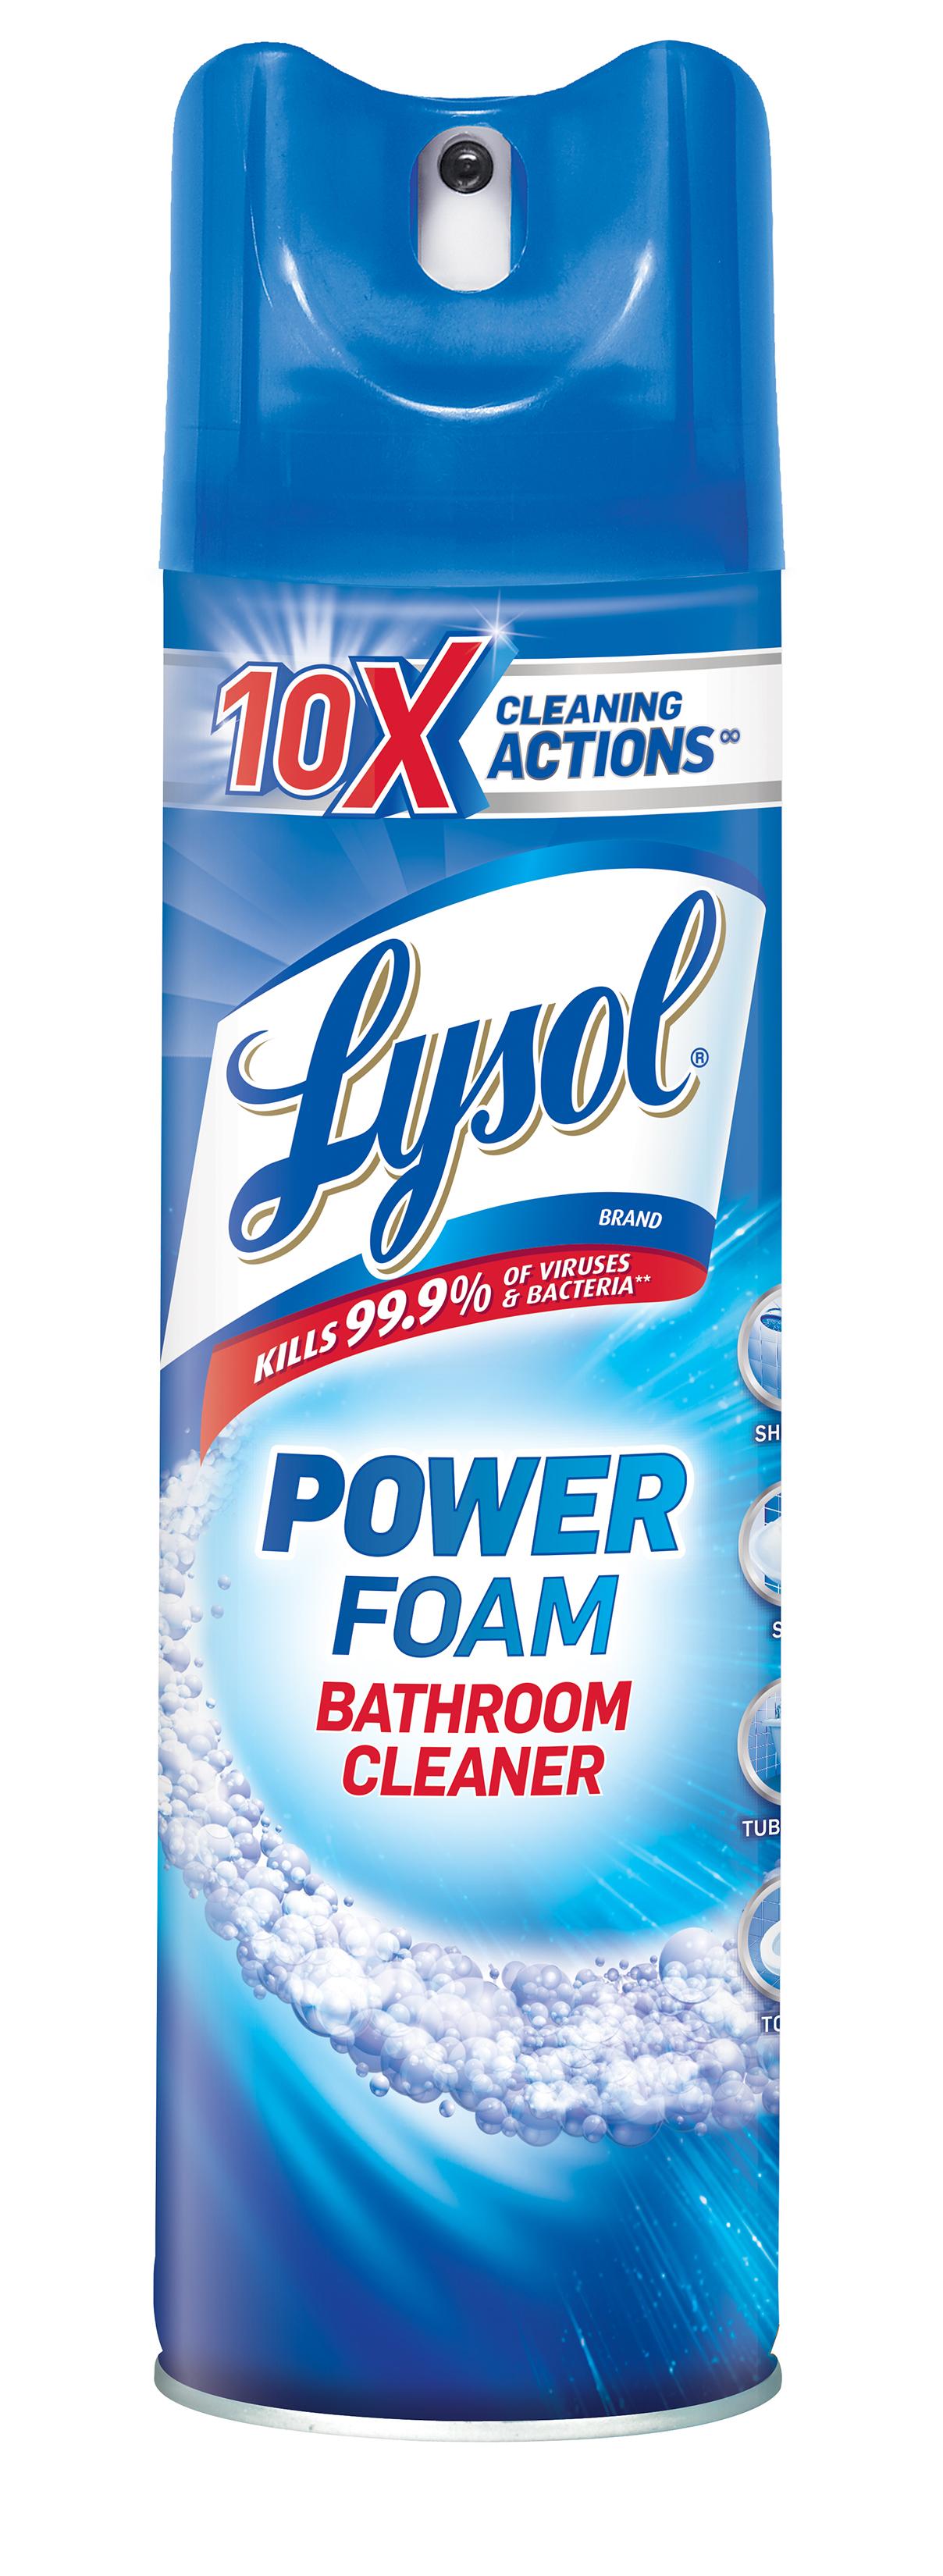 LYSOL® Power Foam Bathroom Cleaner